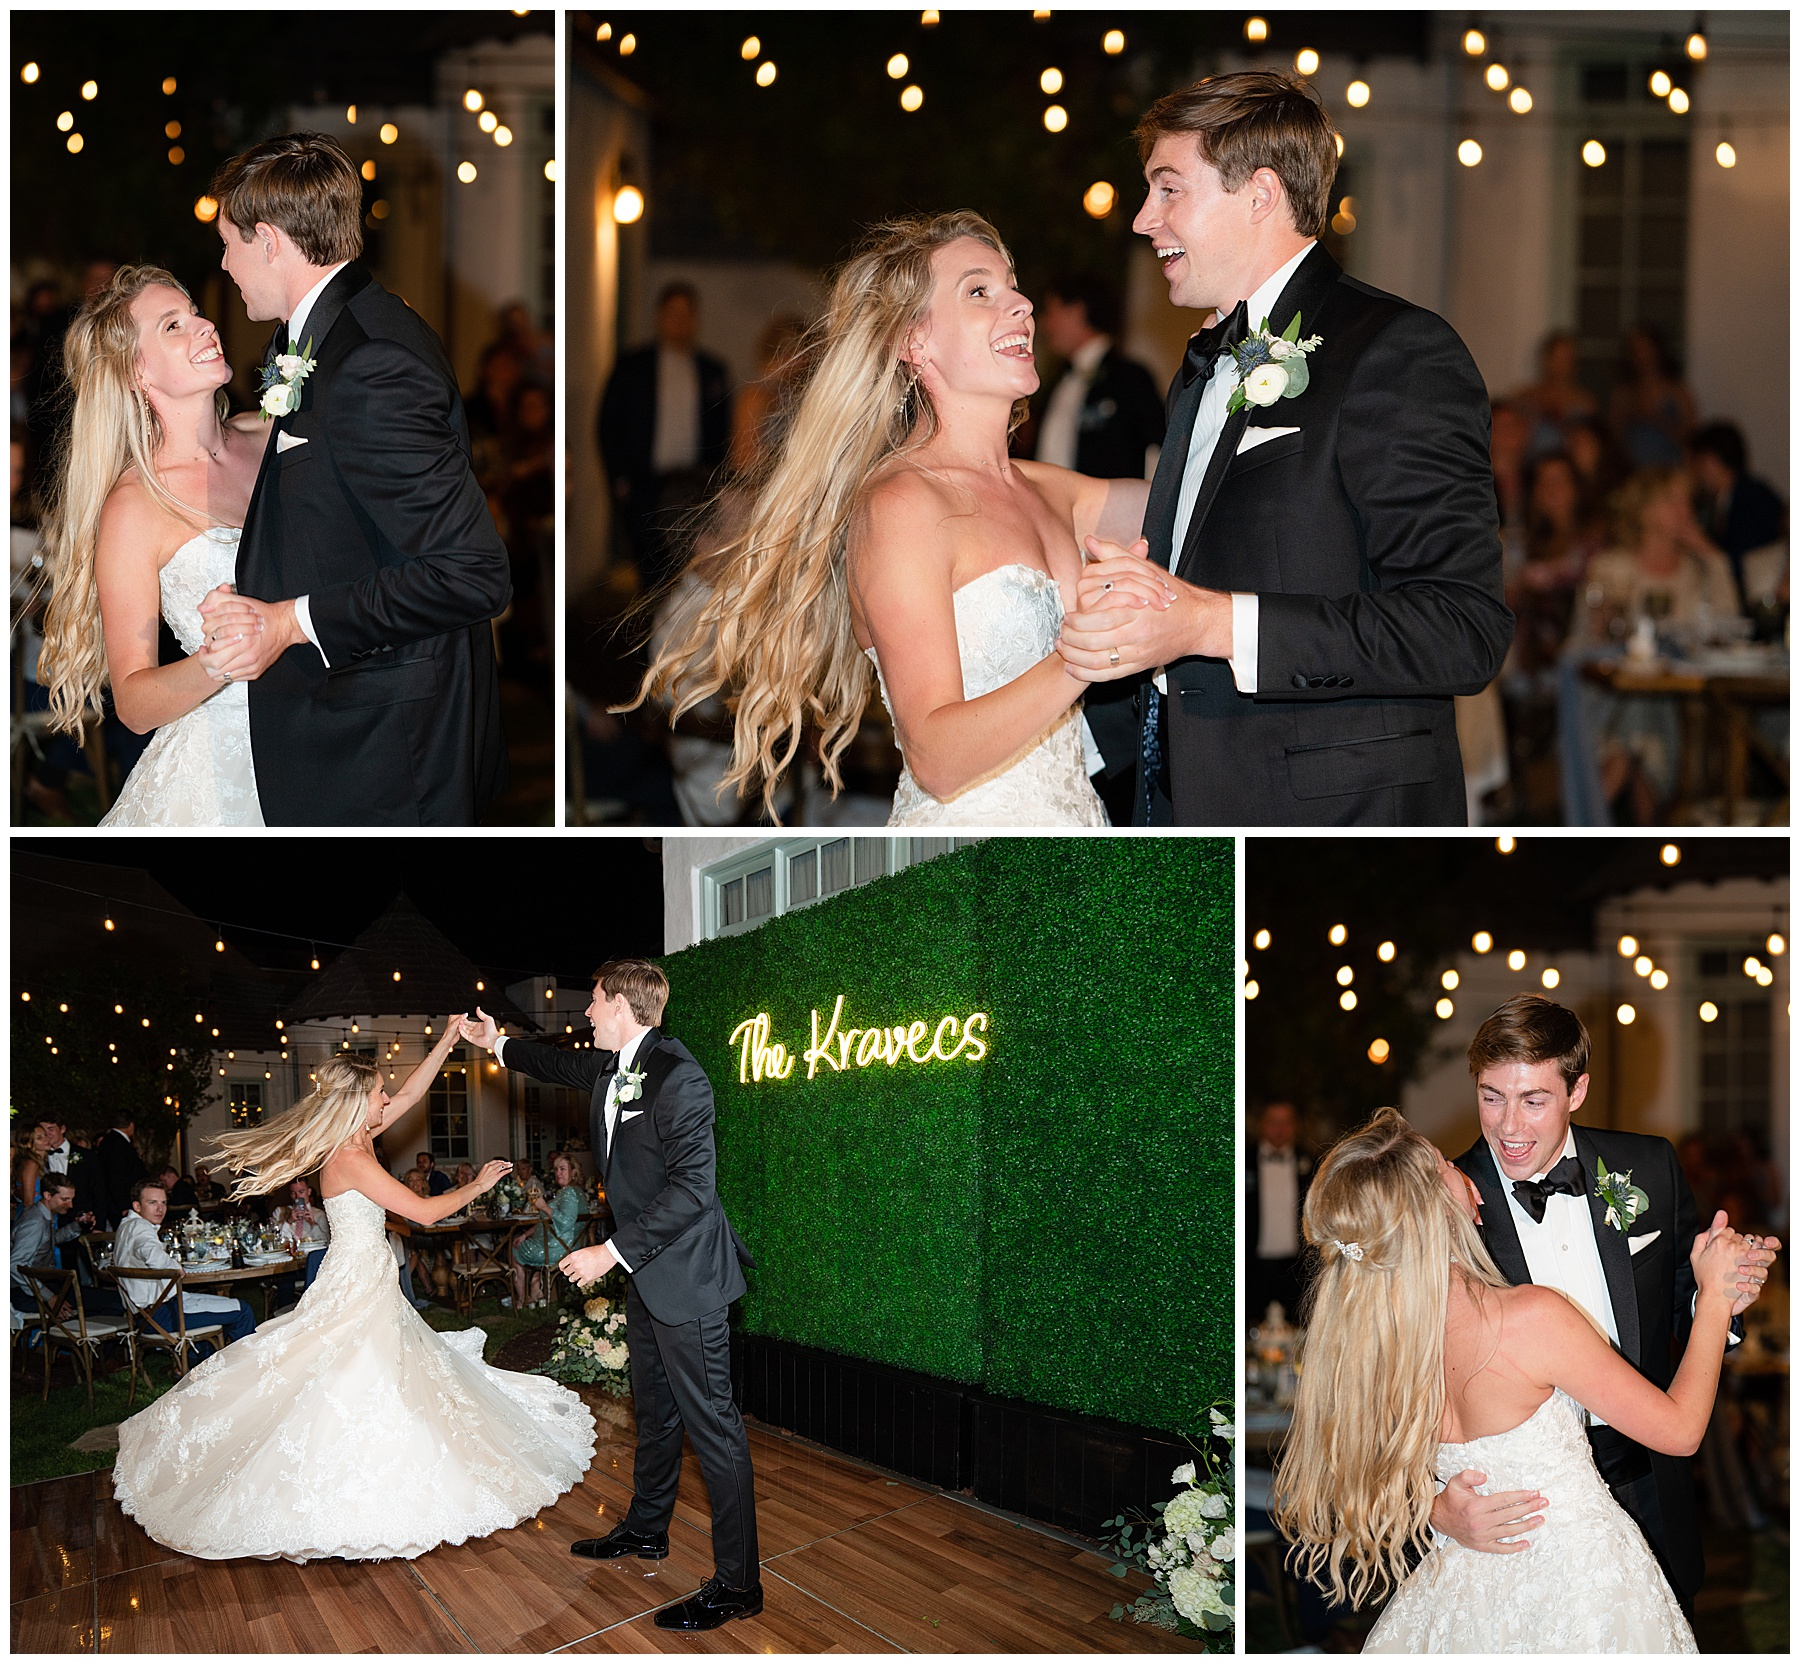 backyard wedding first dance